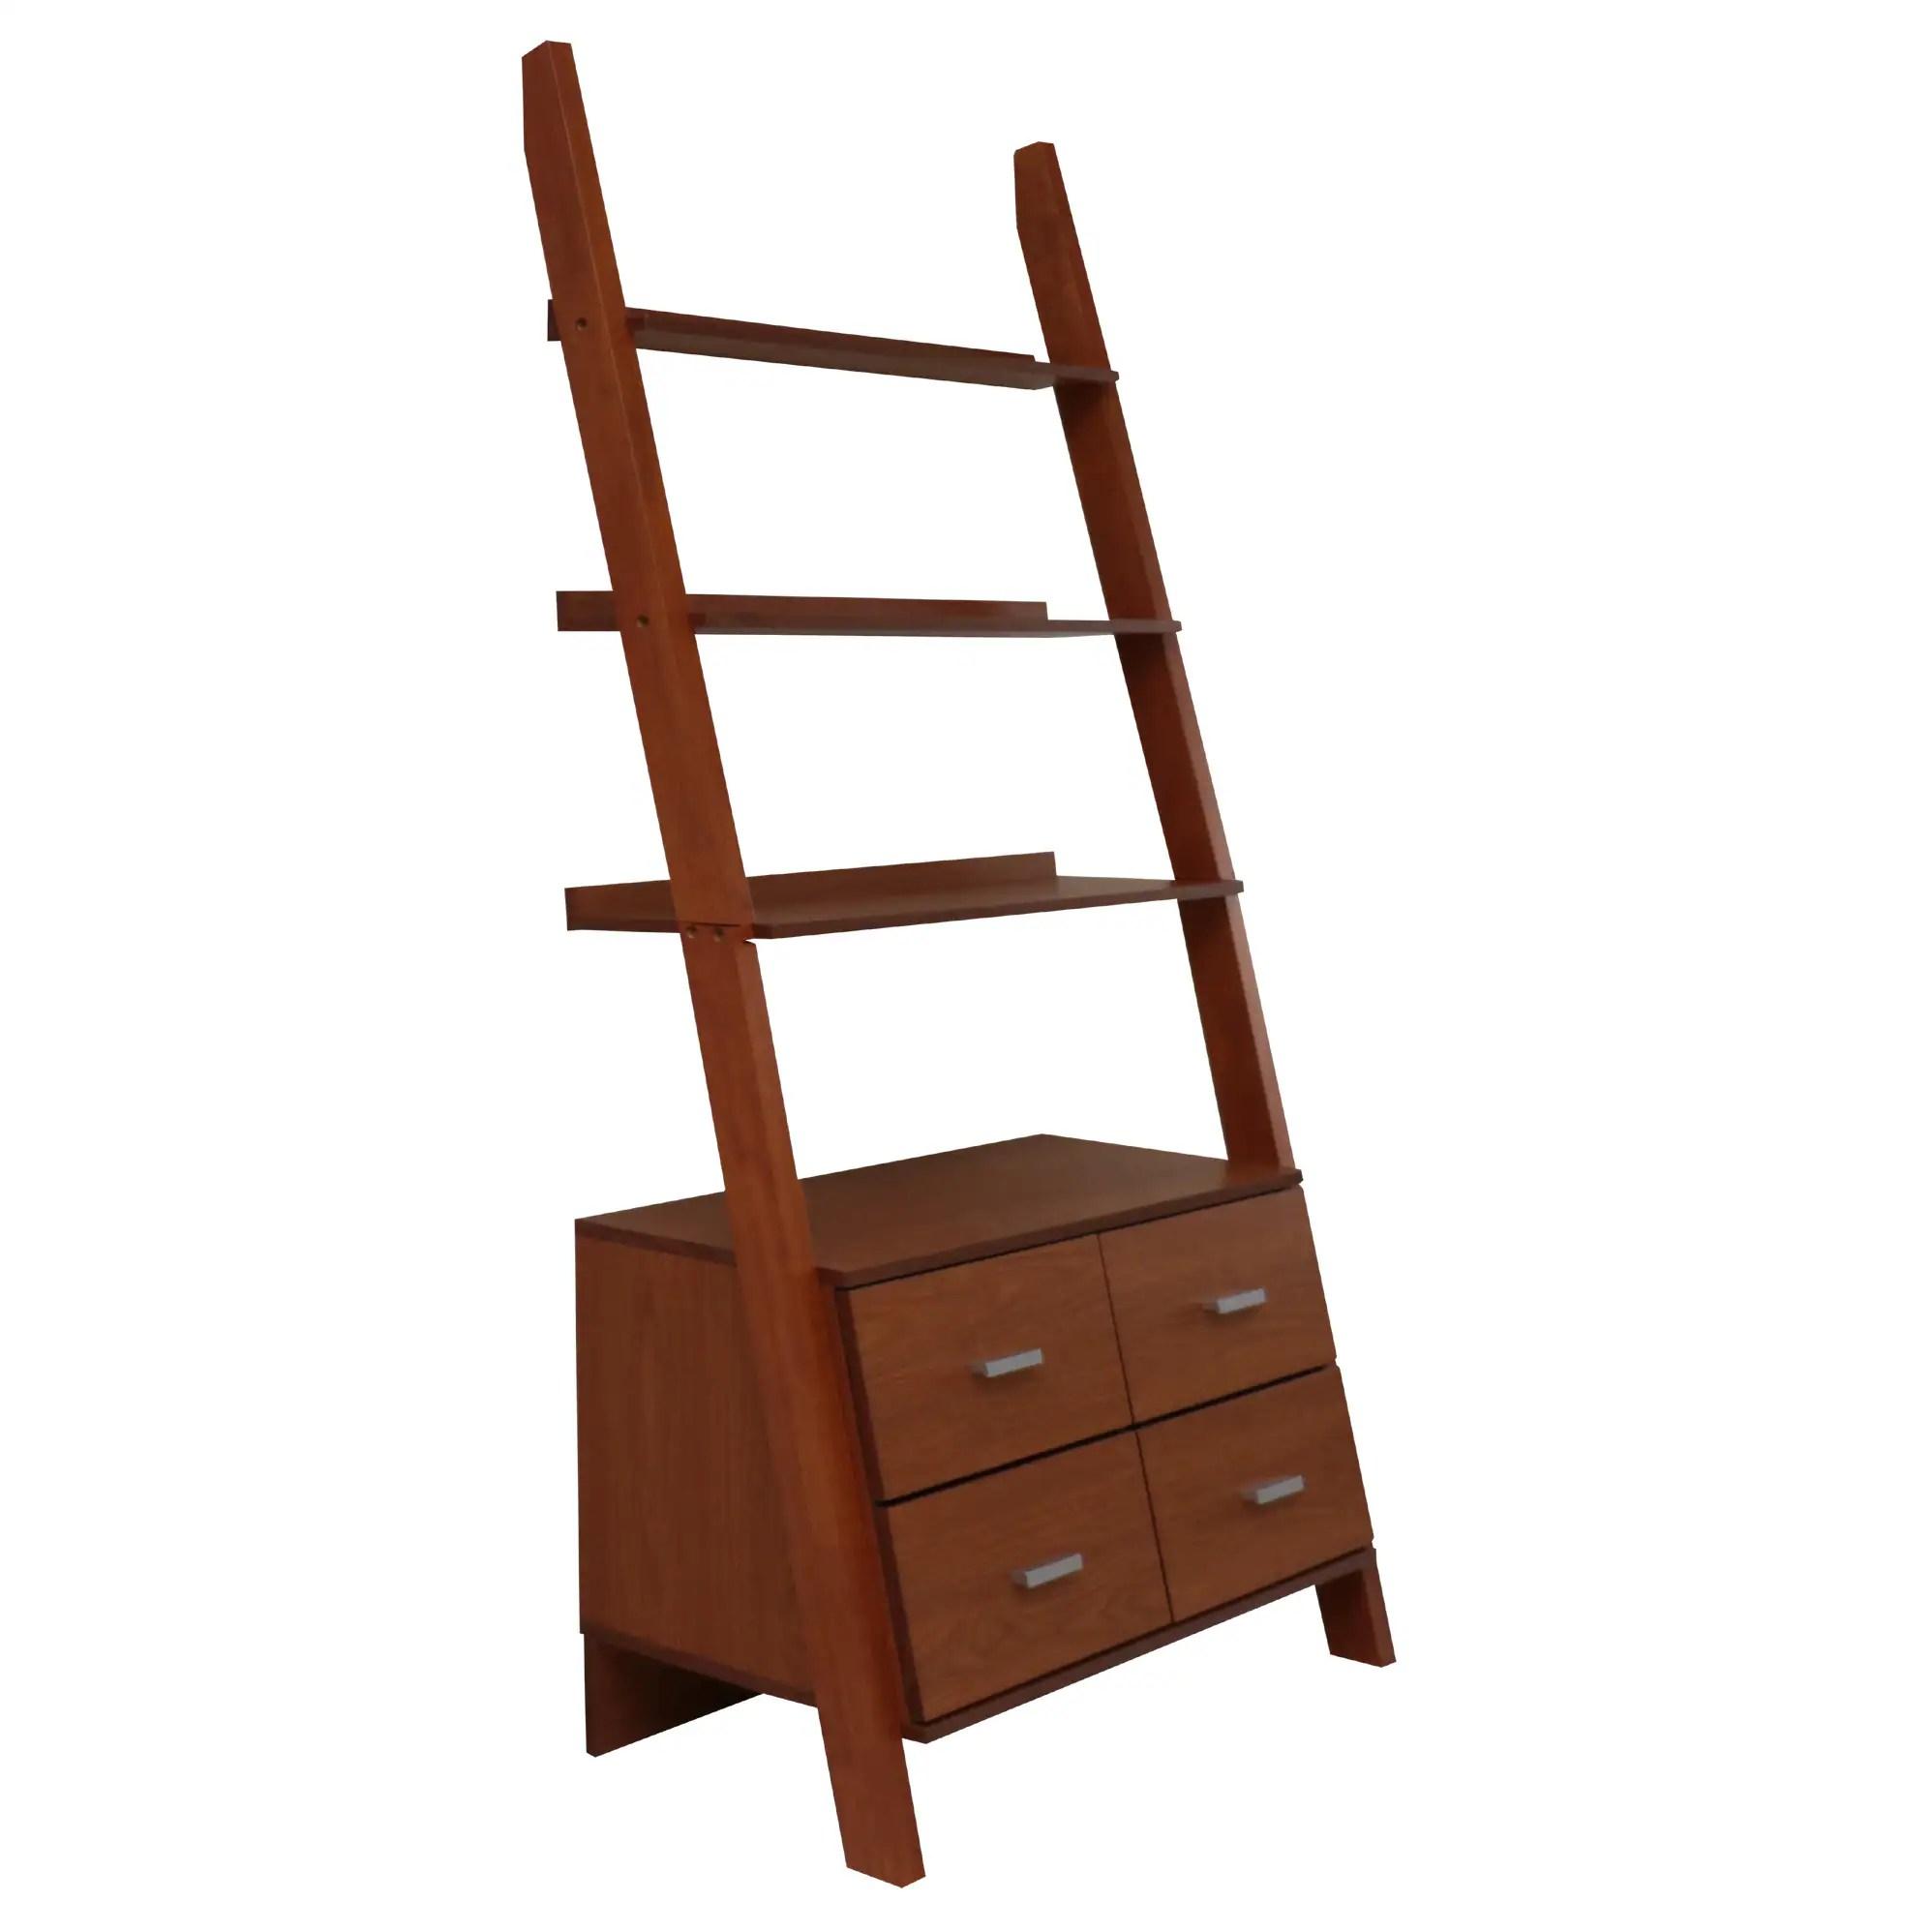 Oak Finished Leaning Ladder Bookshelf With Drawers